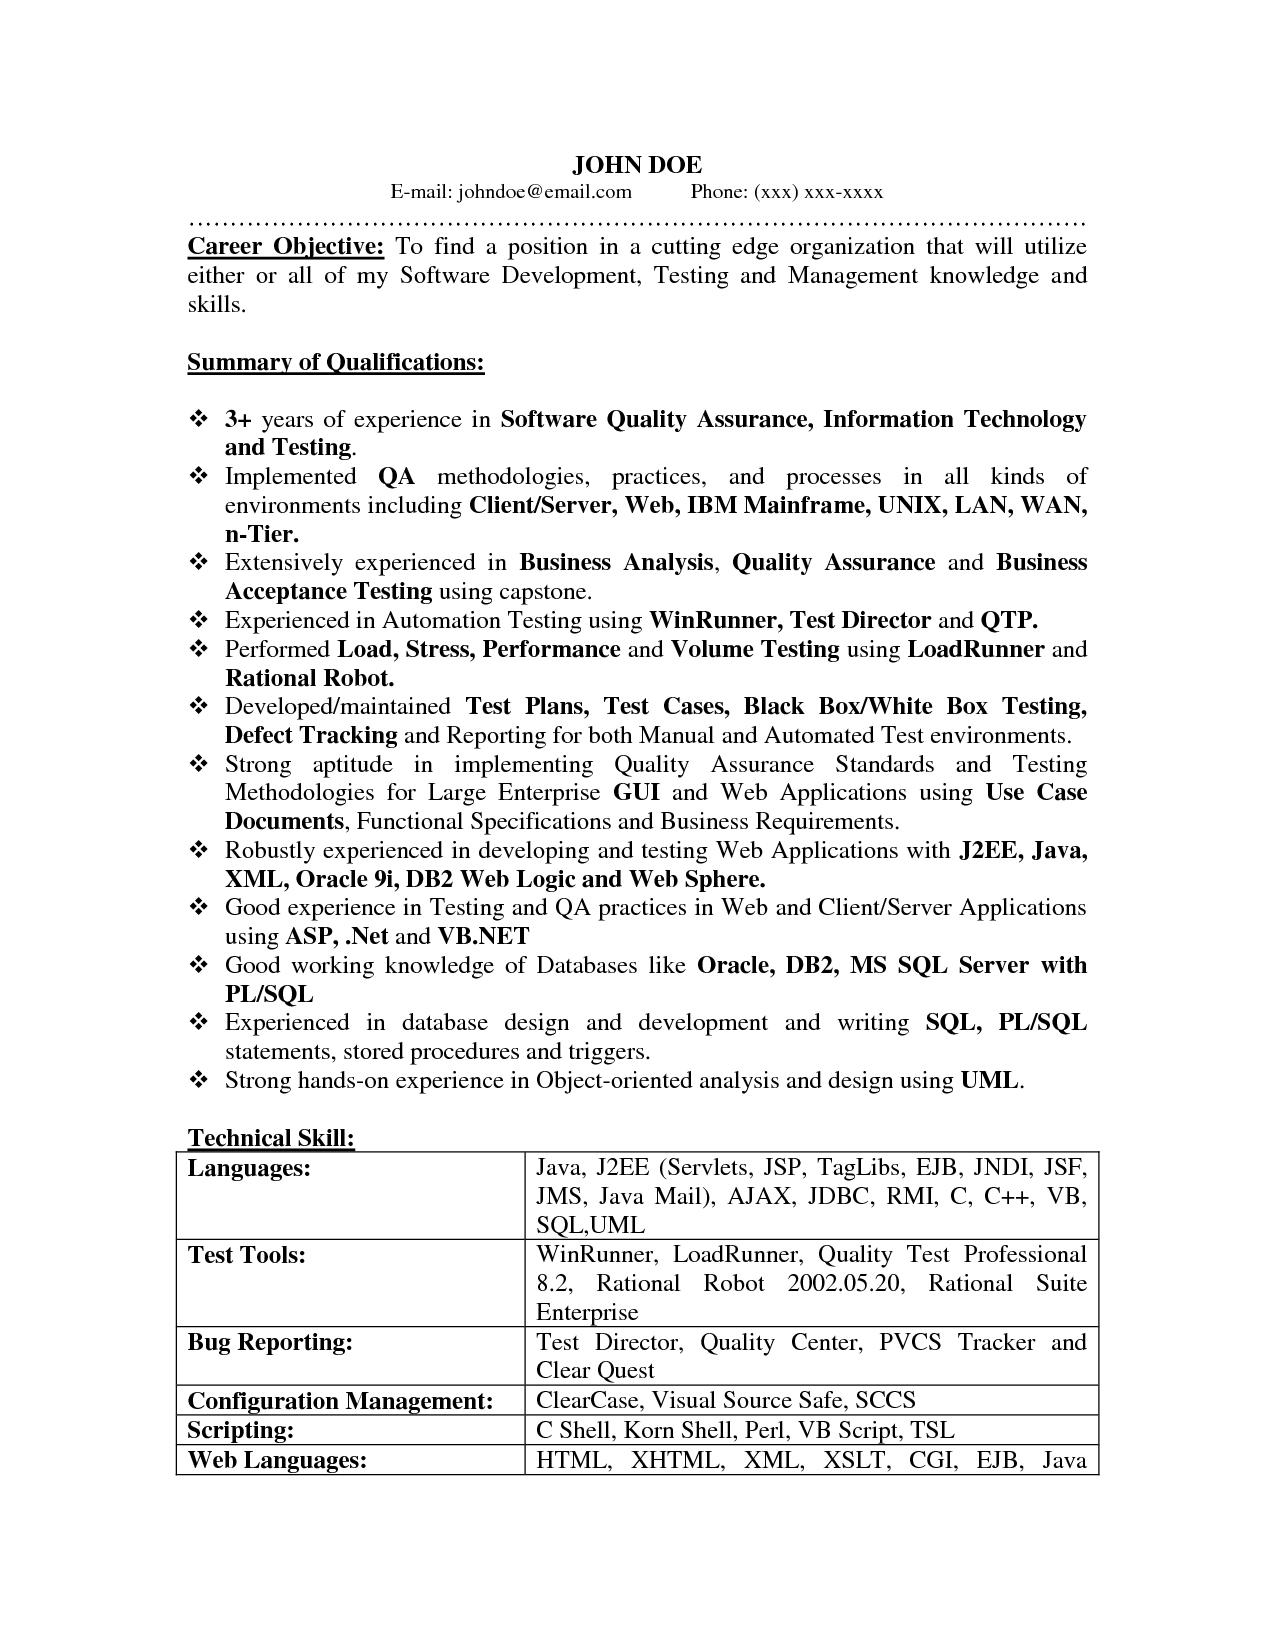 QA resume Resume objective sample, Career objectives for